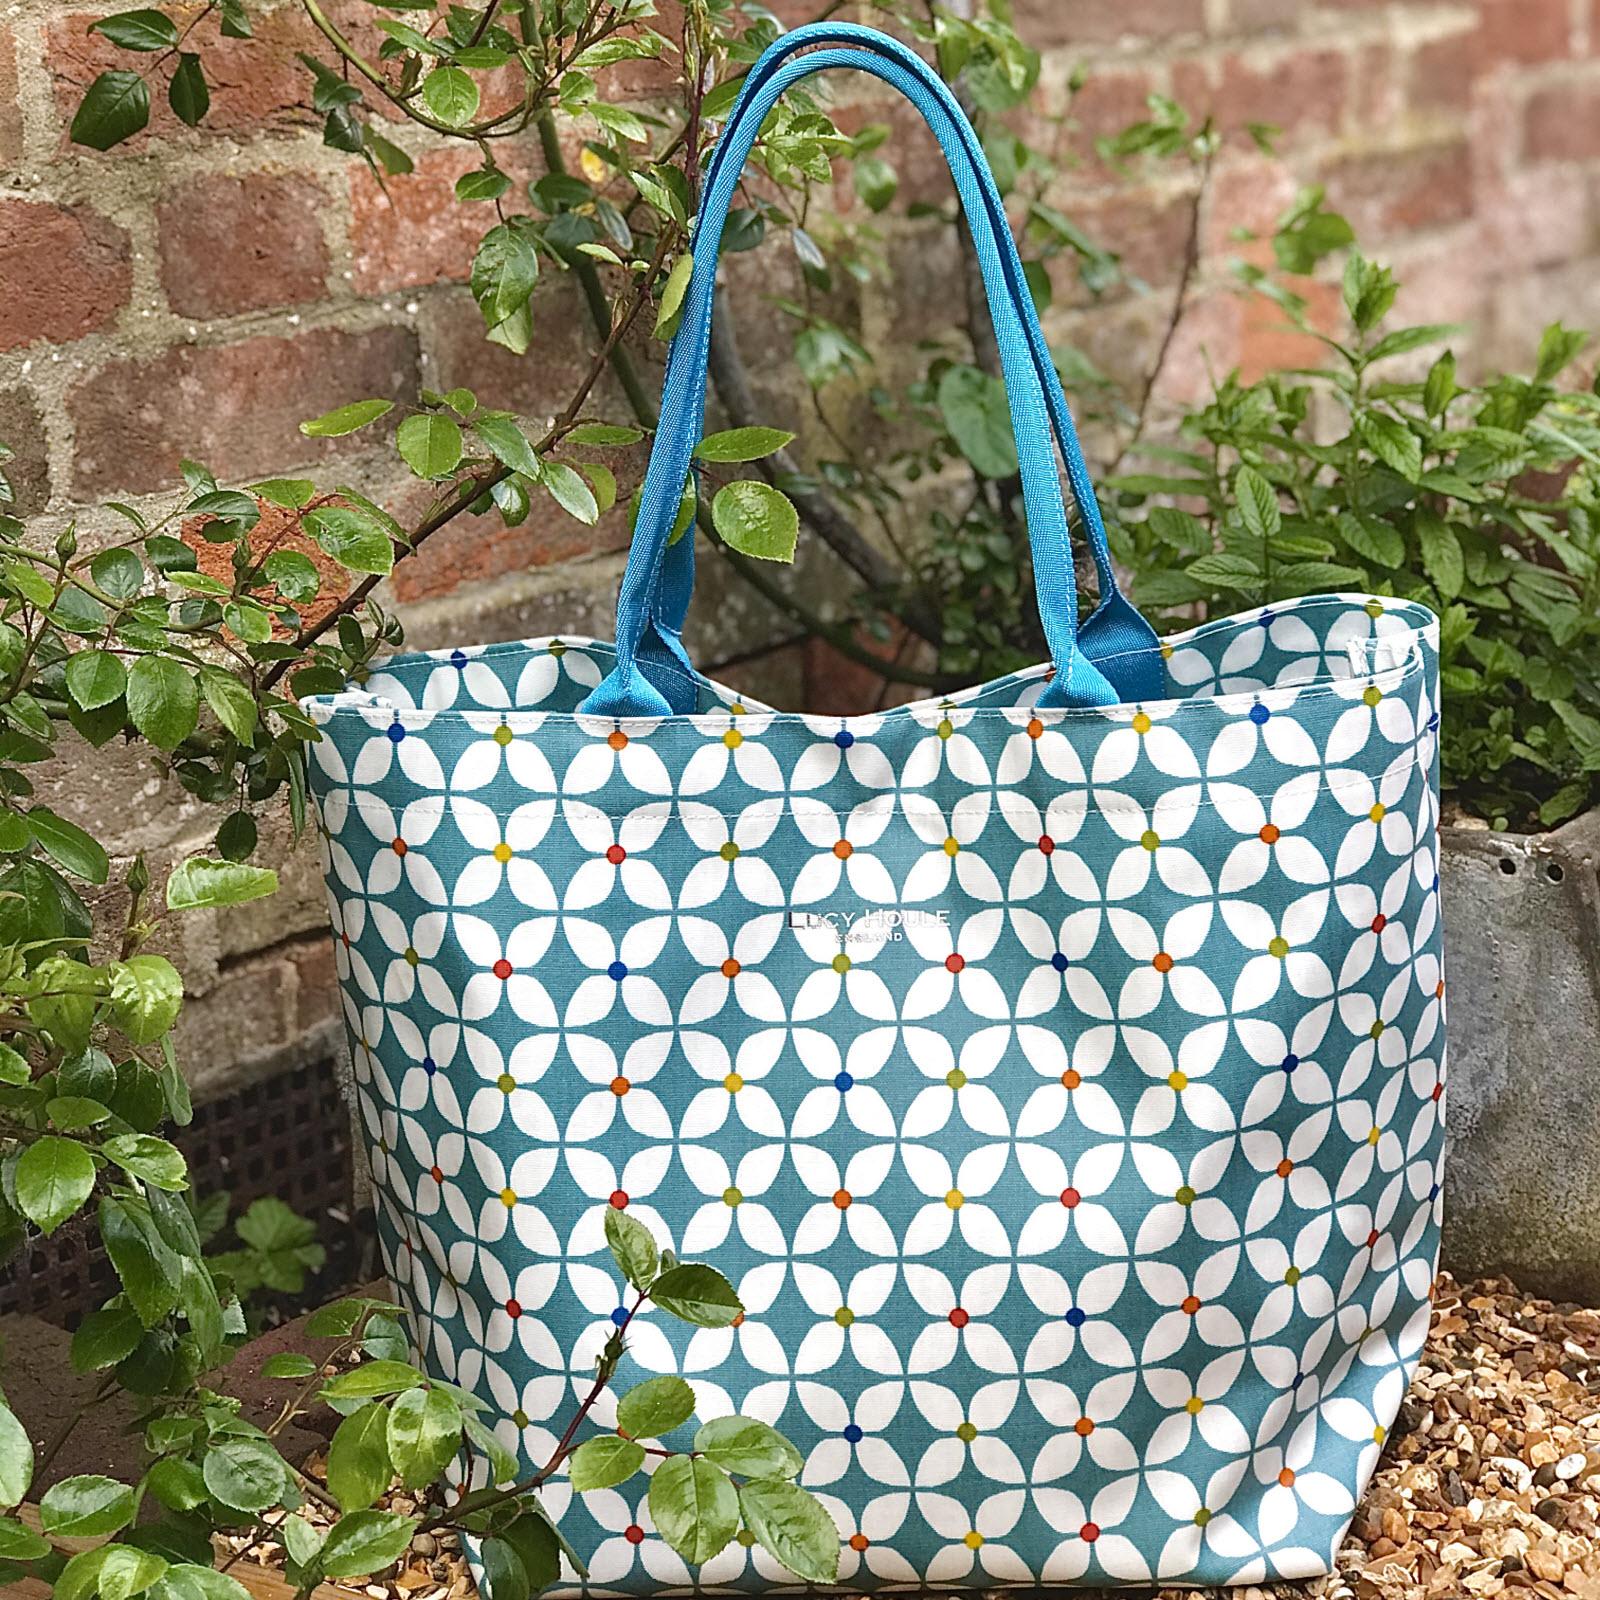 Modern Daisy Aqua Large Tote Bag with Aqua Handles